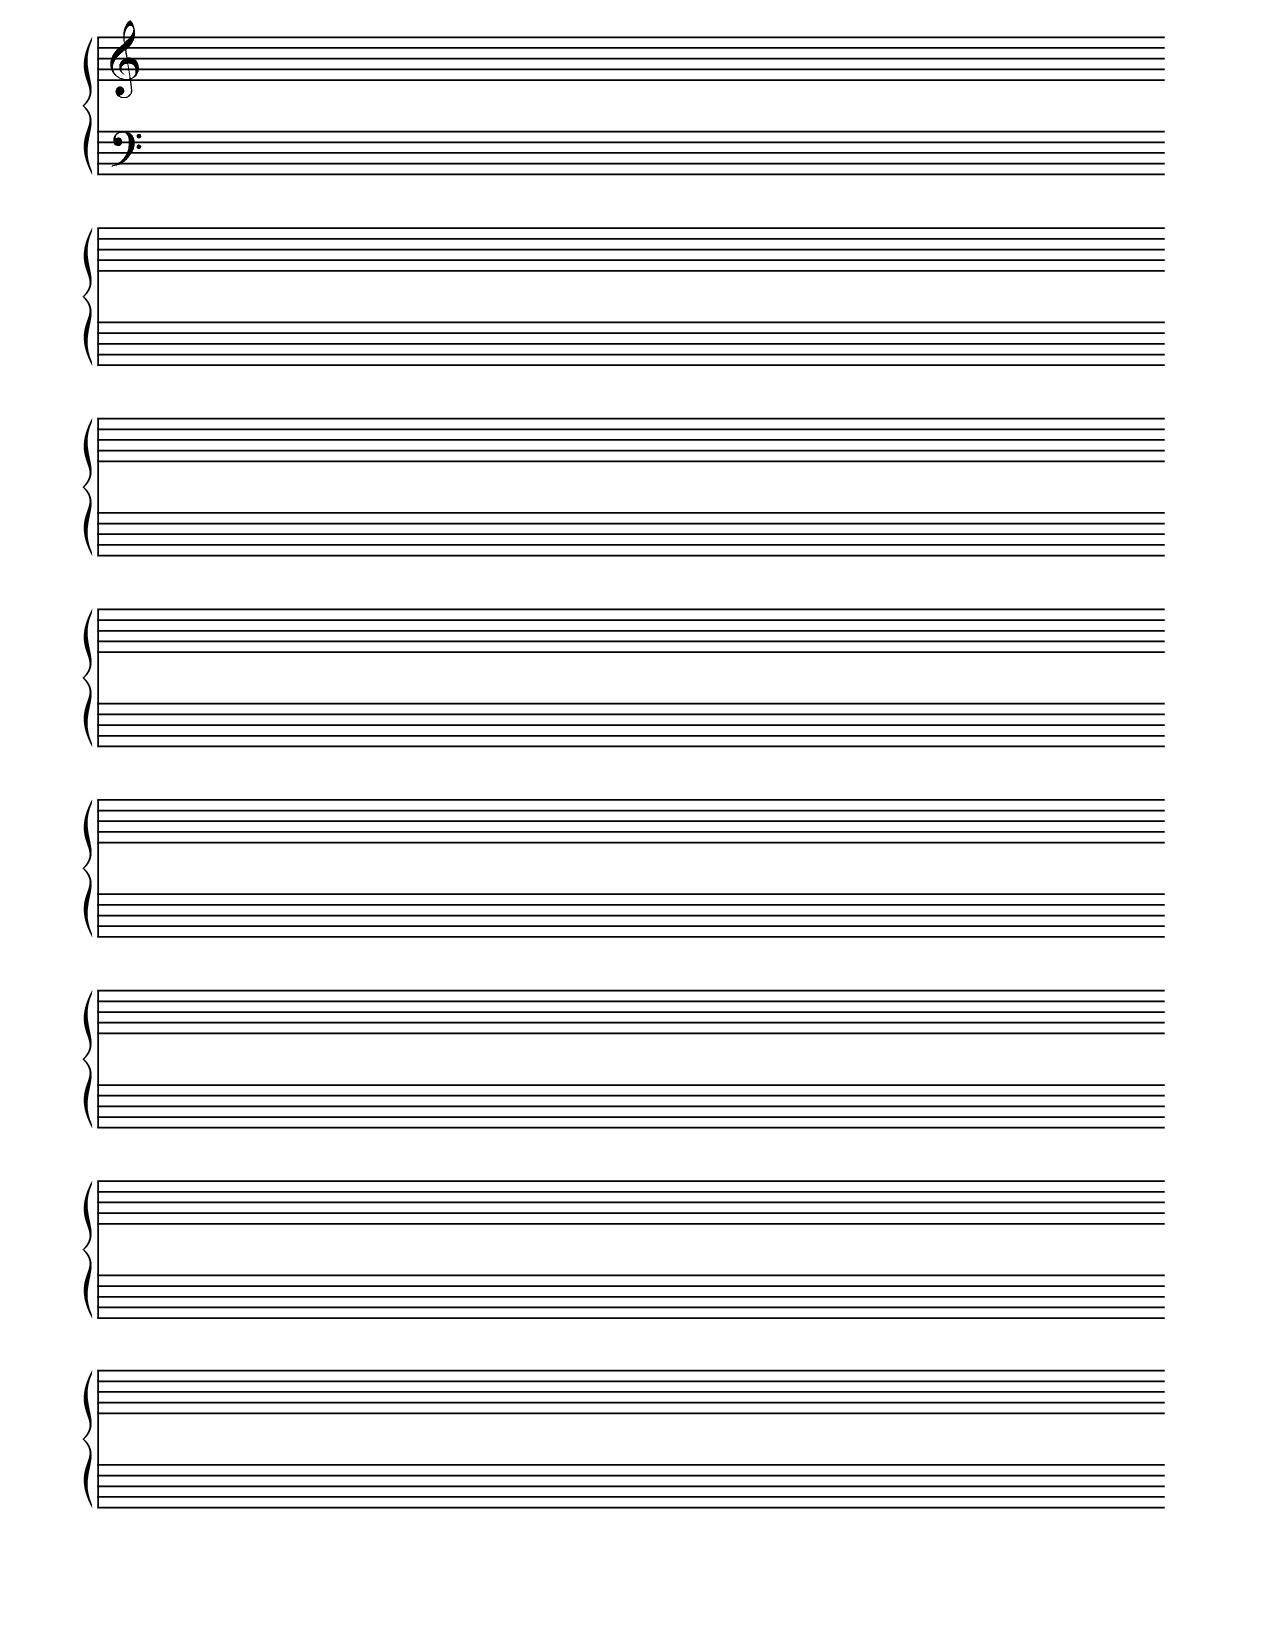 Free Sheet Music Paper - Kaza.psstech.co - Free Printable Staff Paper Blank Sheet Music Net